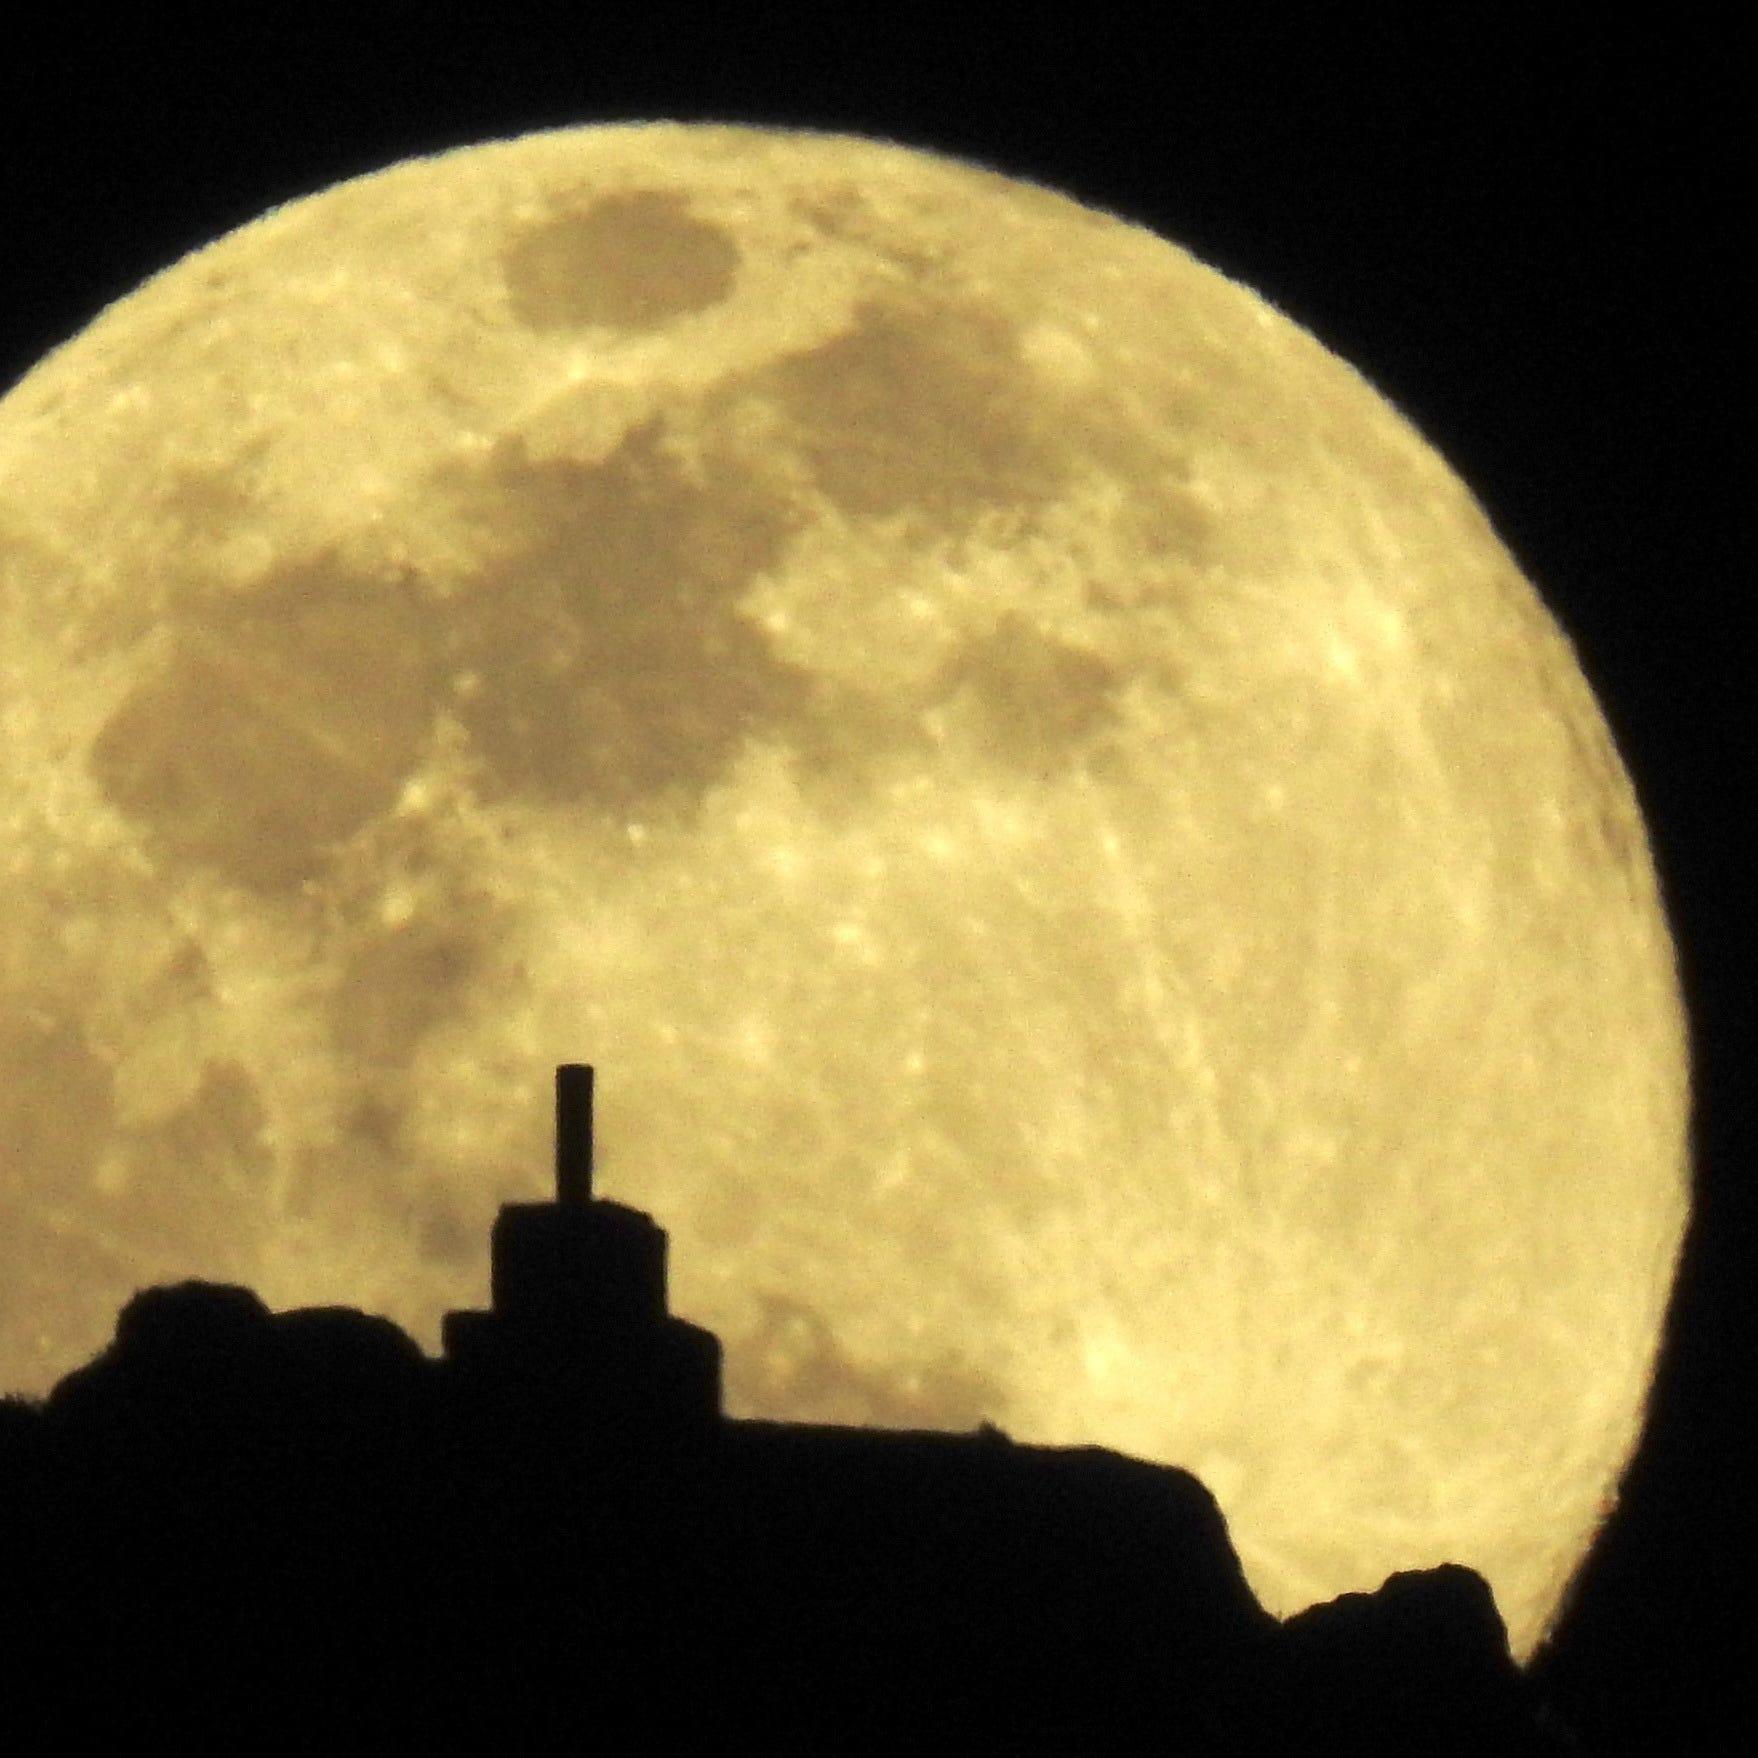 Best space photos of the week: Super worm equinox moon